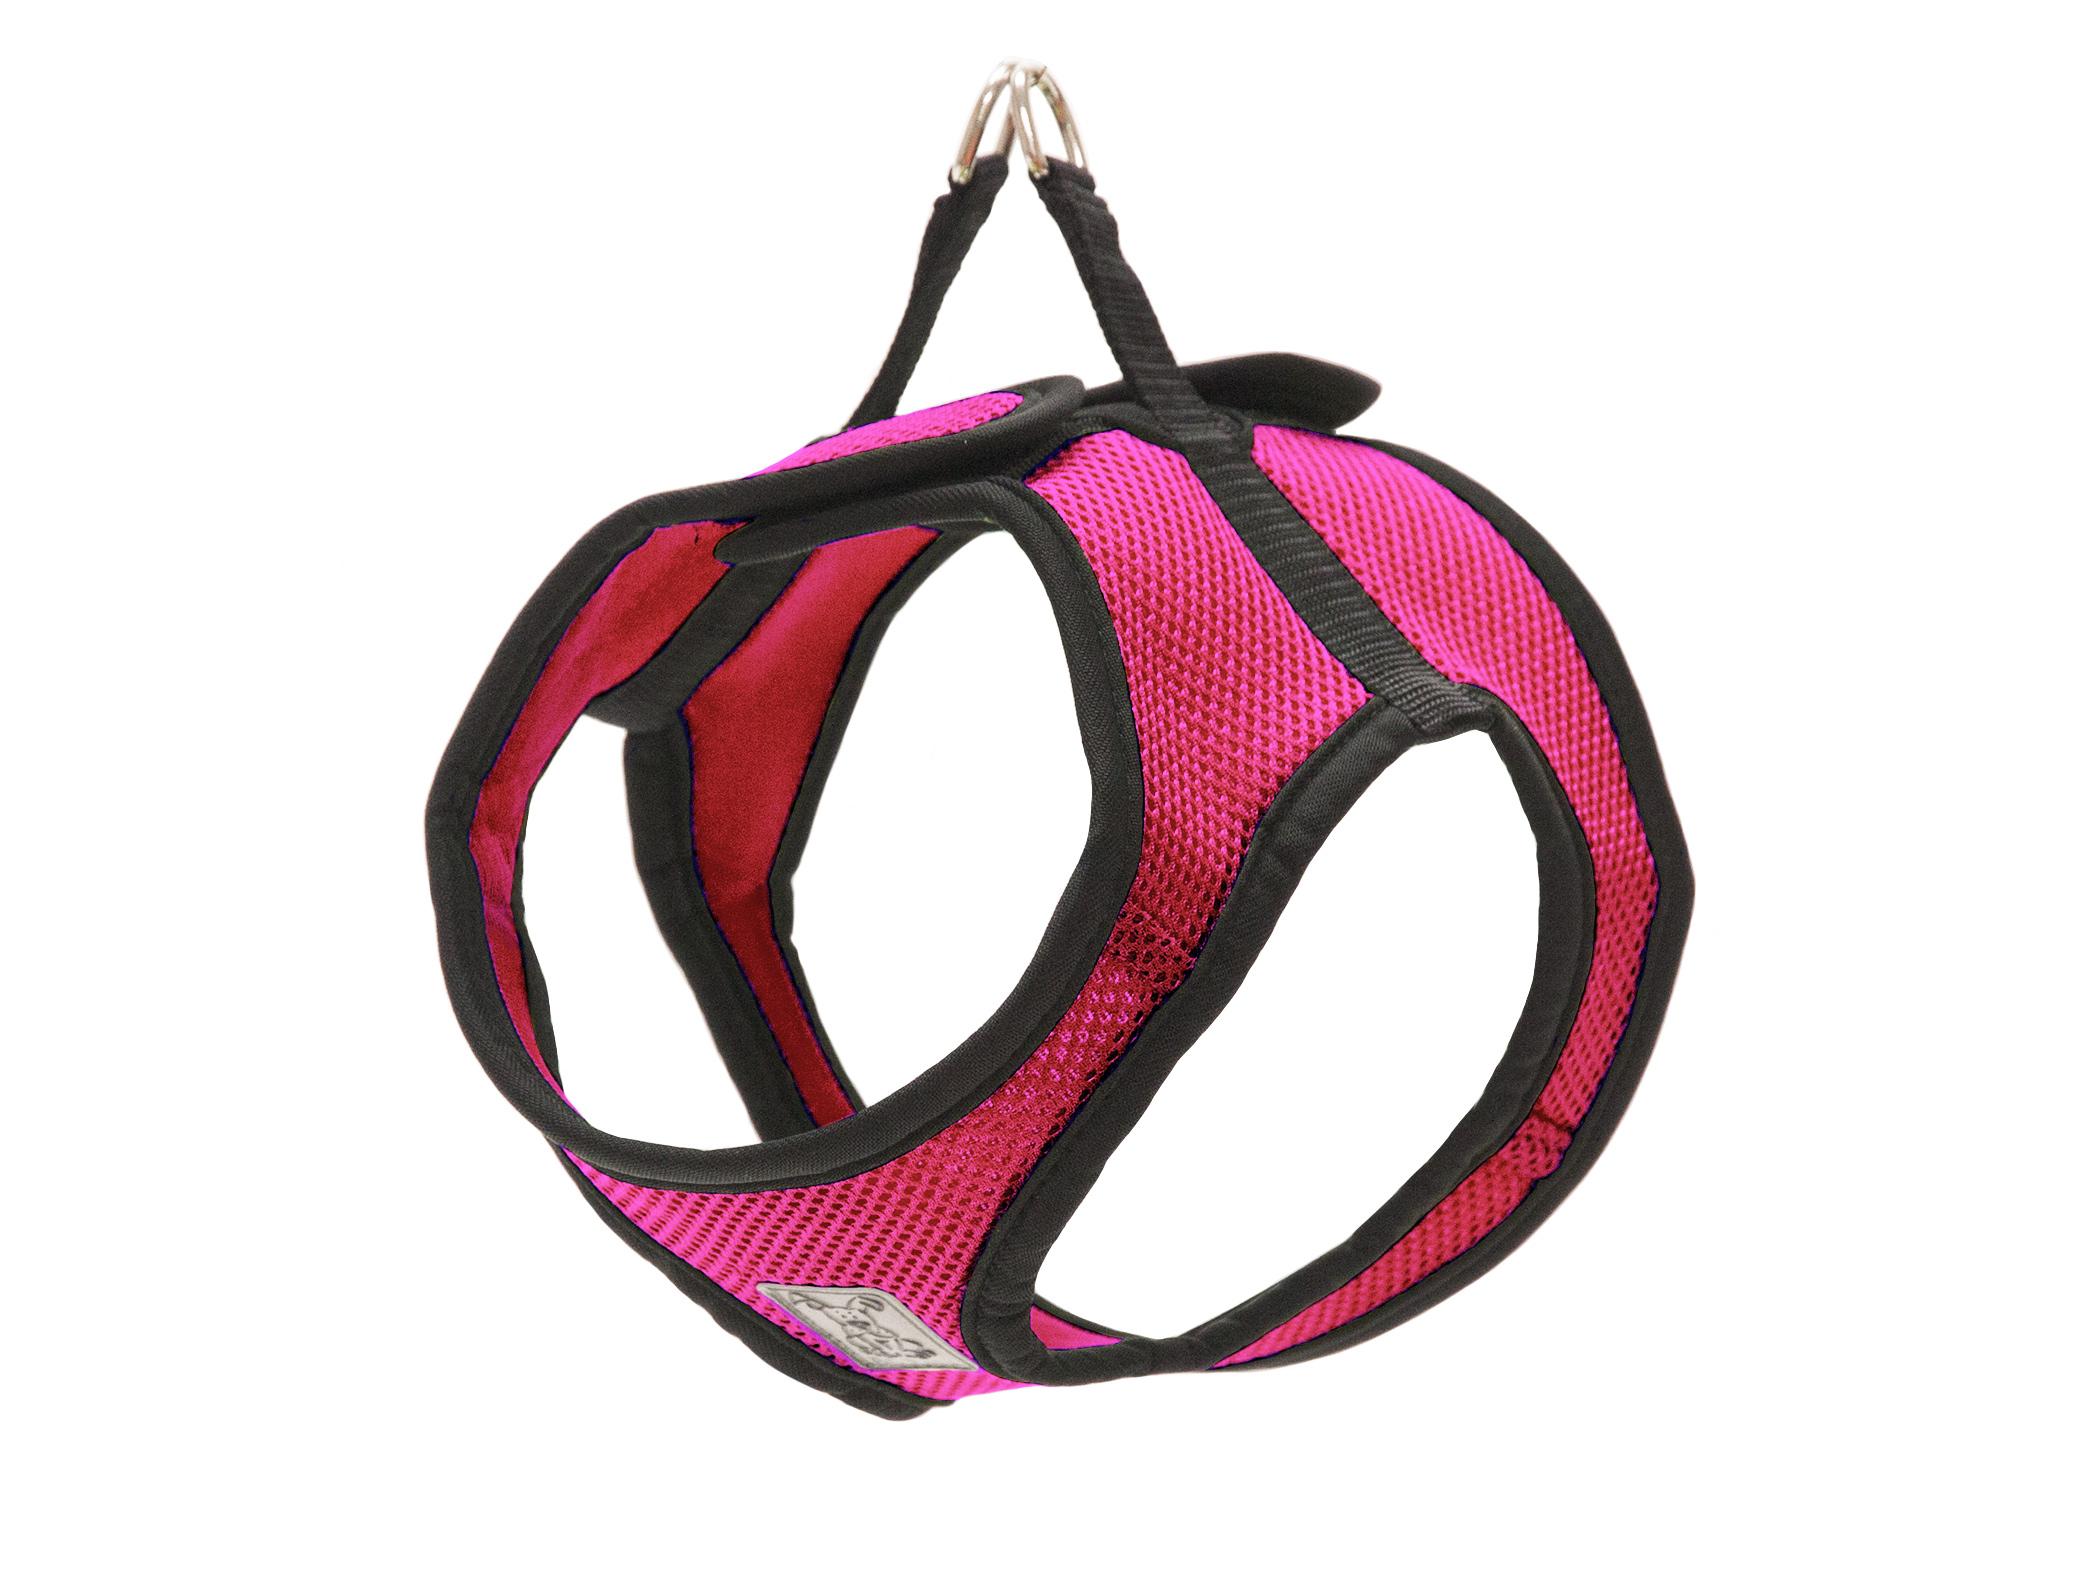 RC Pet ProductsStep-In Cirque Dog Harness, Raspberry, Medium